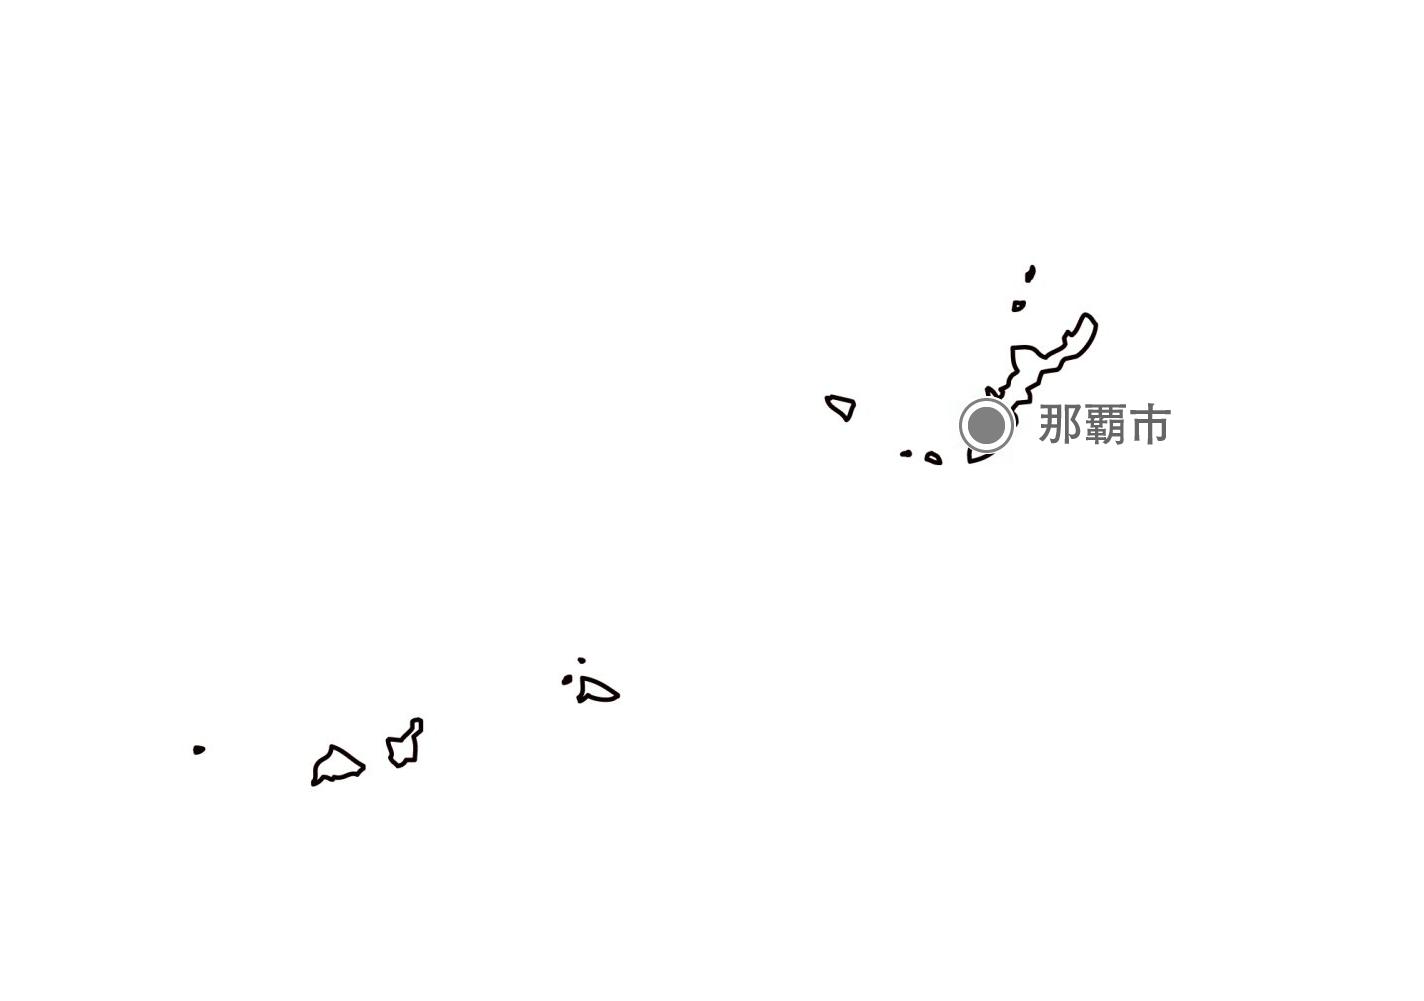 [白地図]沖縄県・都道府県名・県庁所在地あり